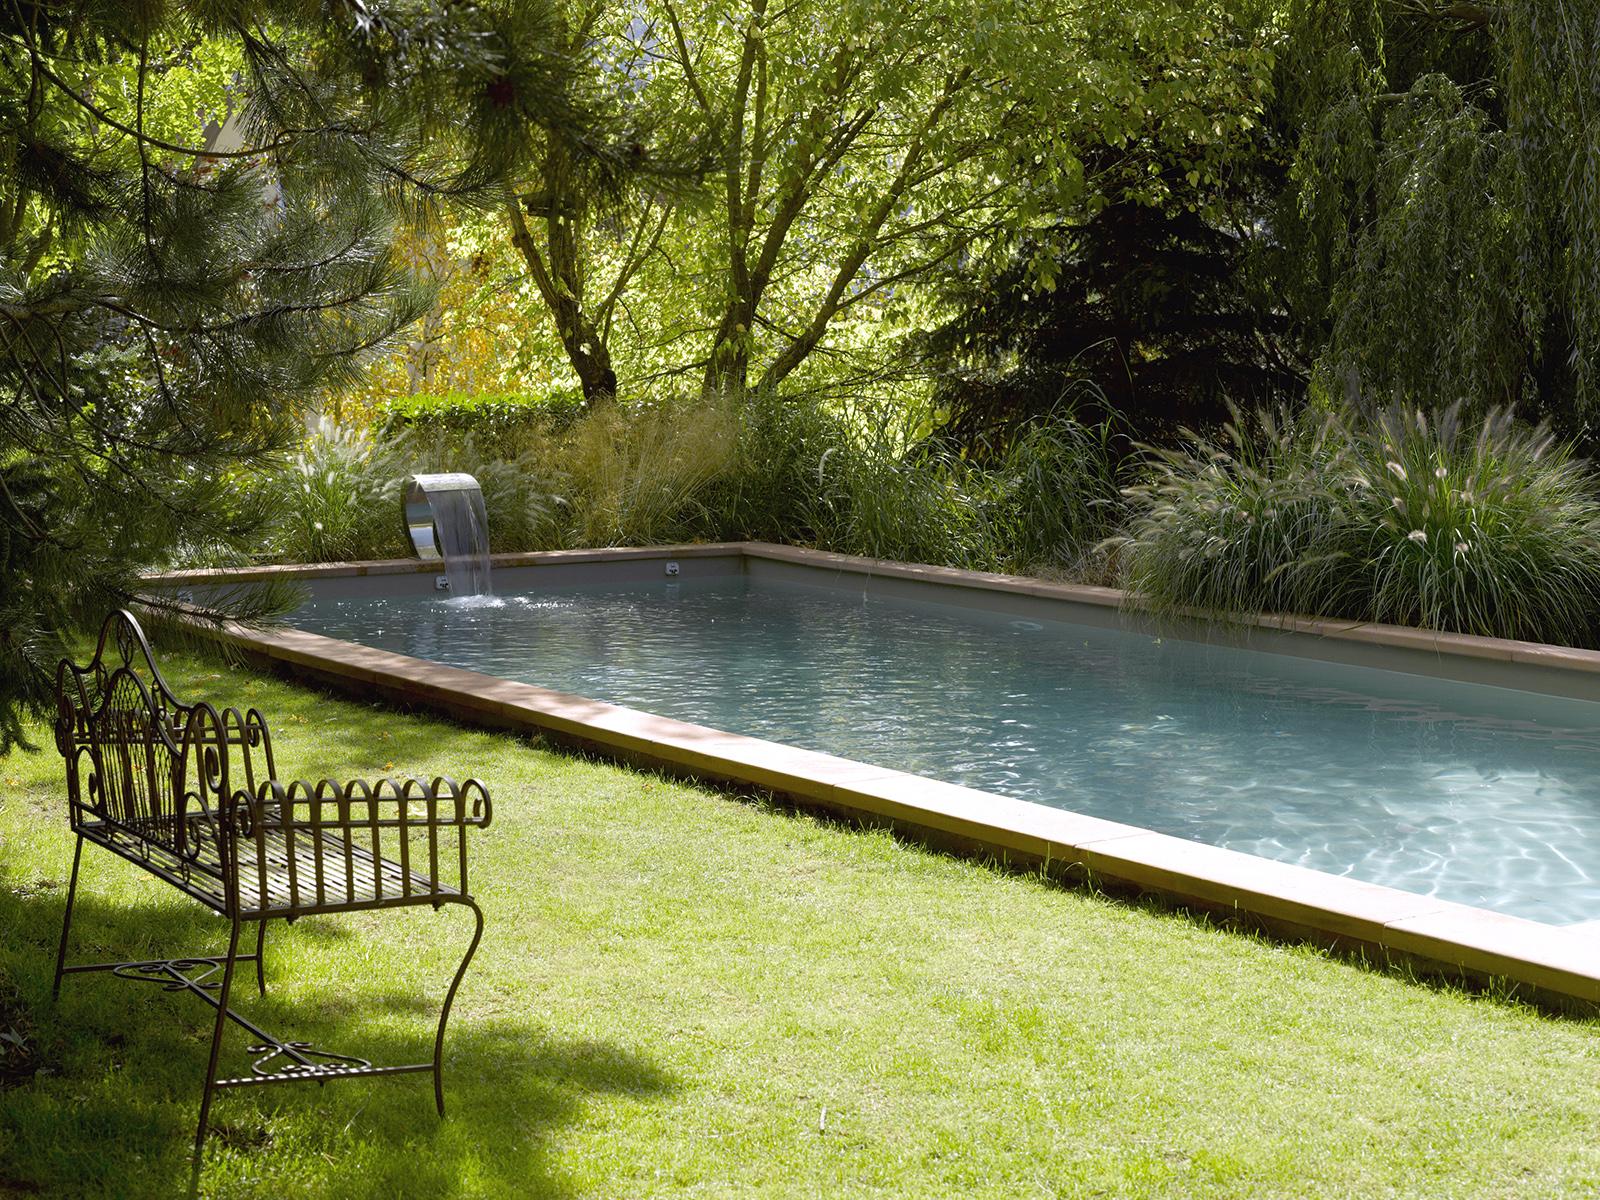 piscine béton en pleine nature